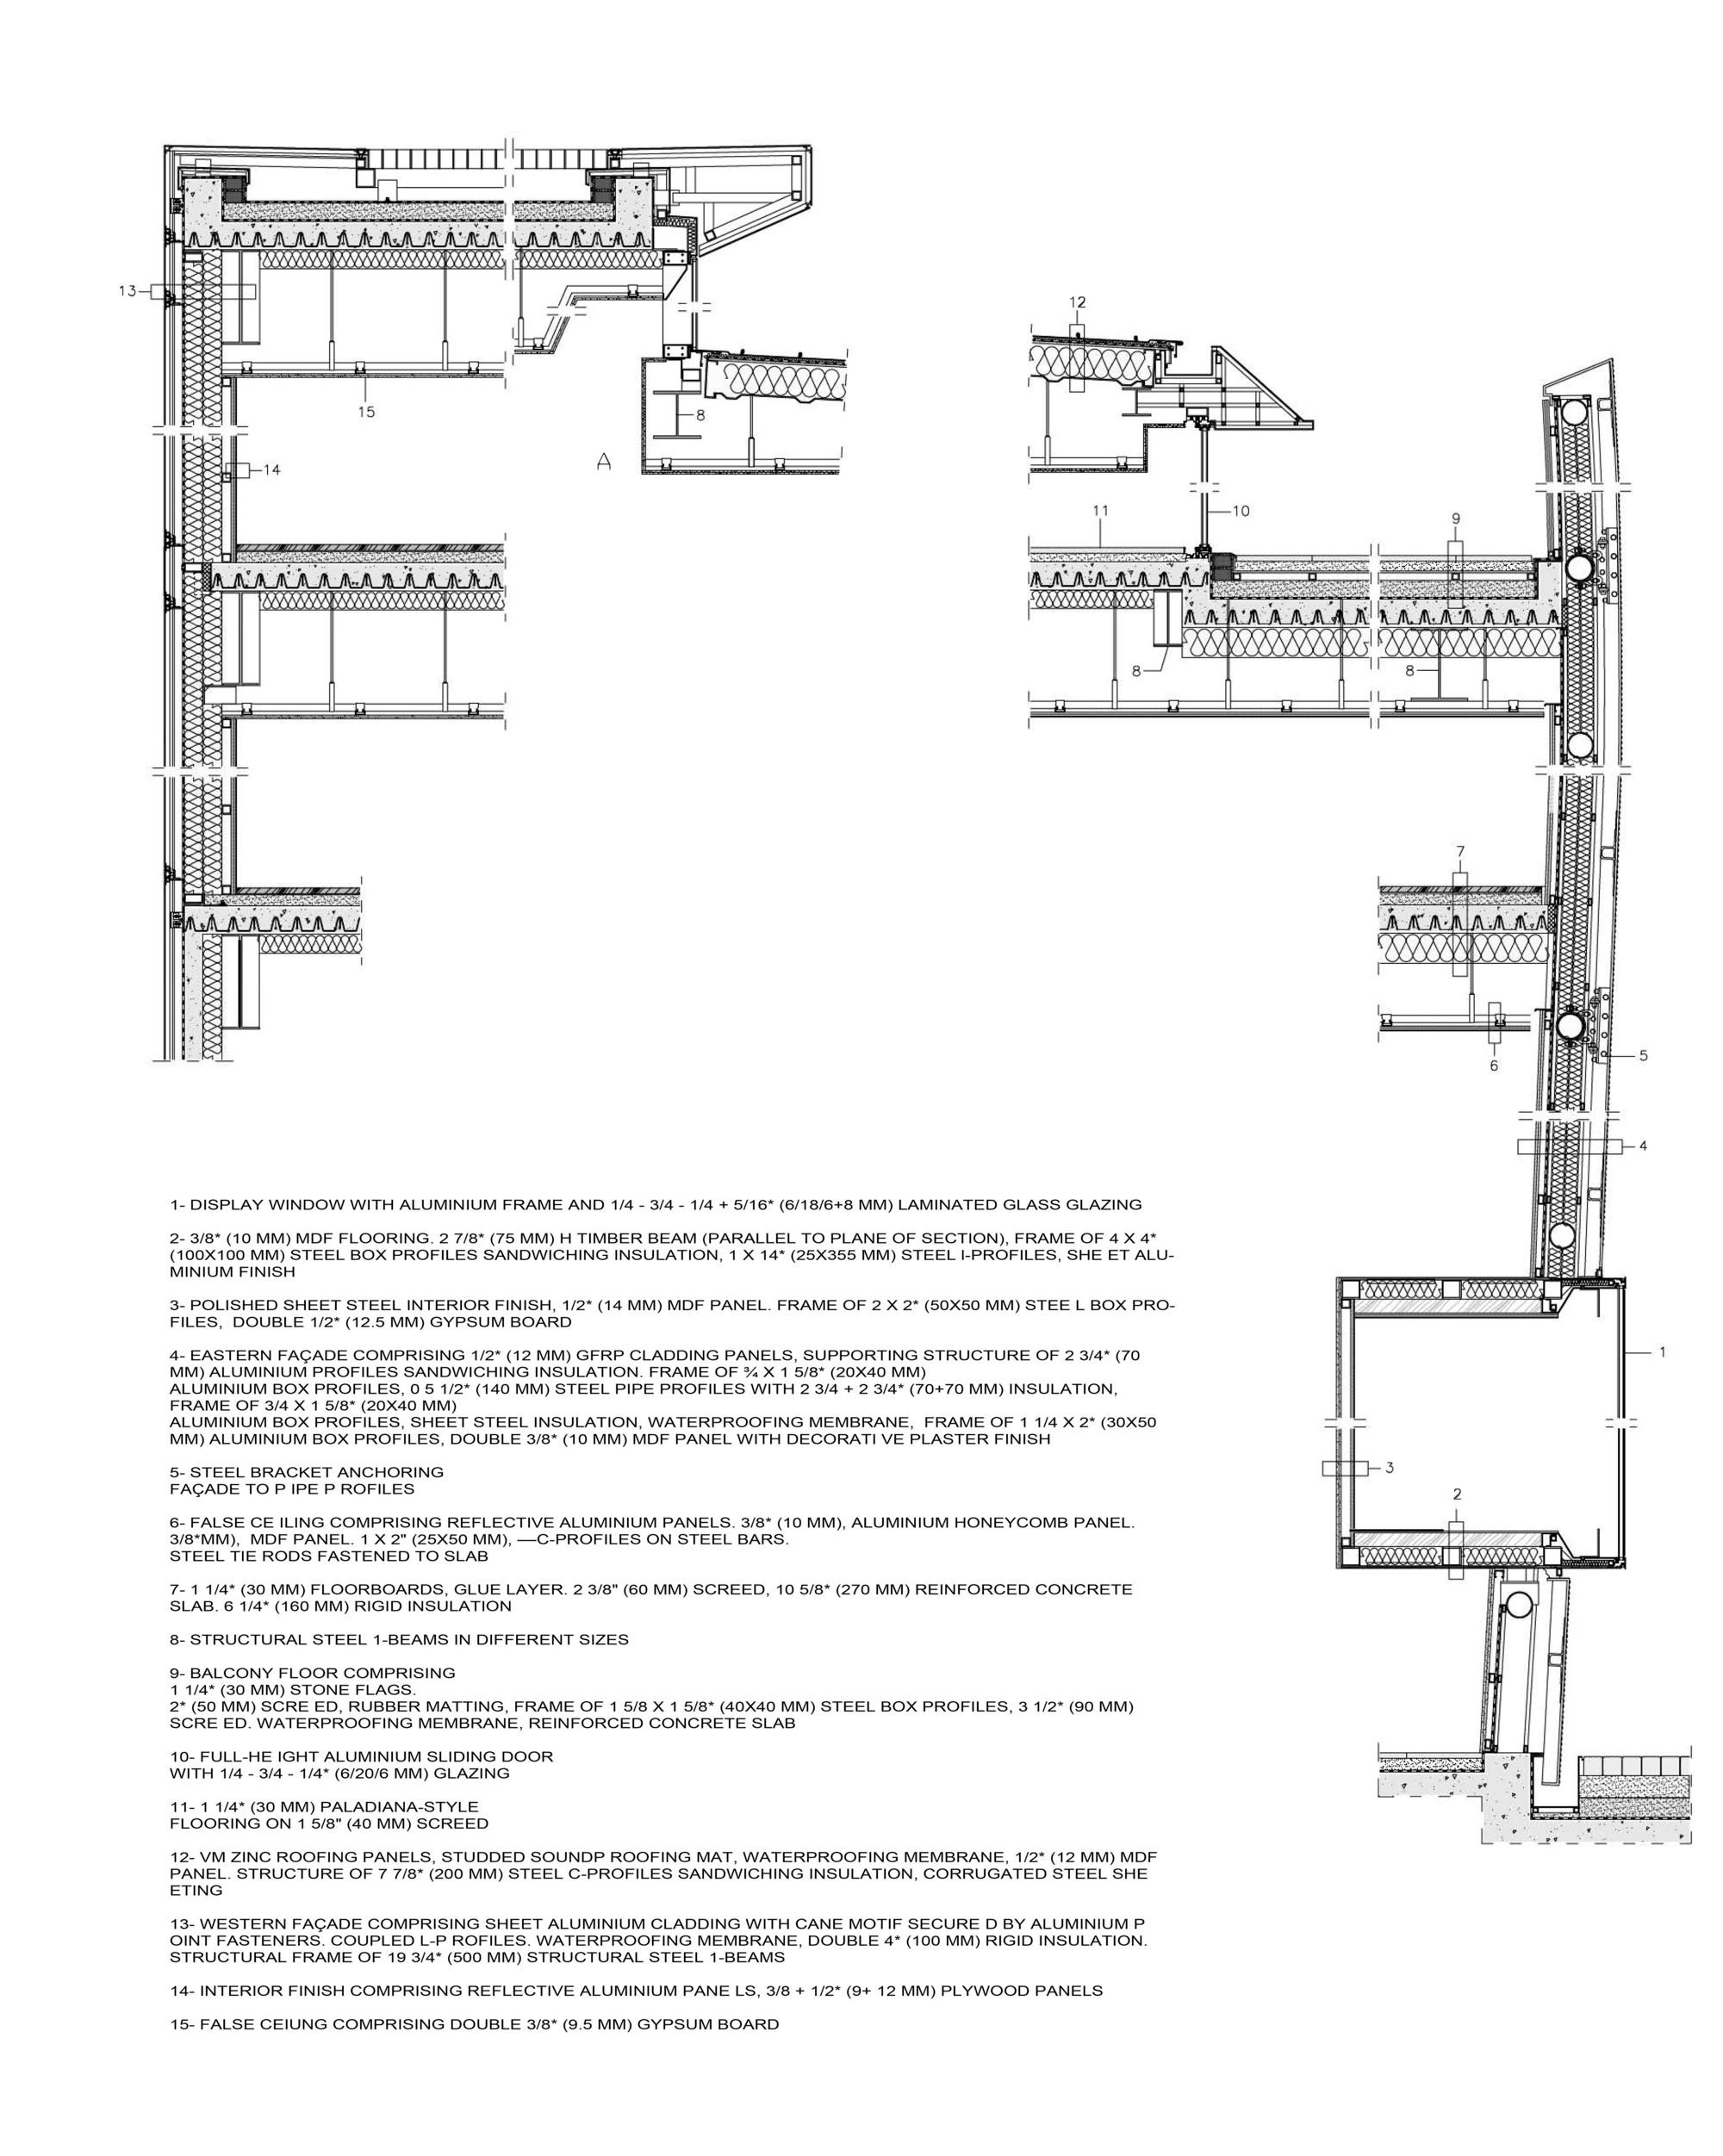 Standard House Measurements Galeria De Casa Dior Em Seul Christian De Portzamparc 53